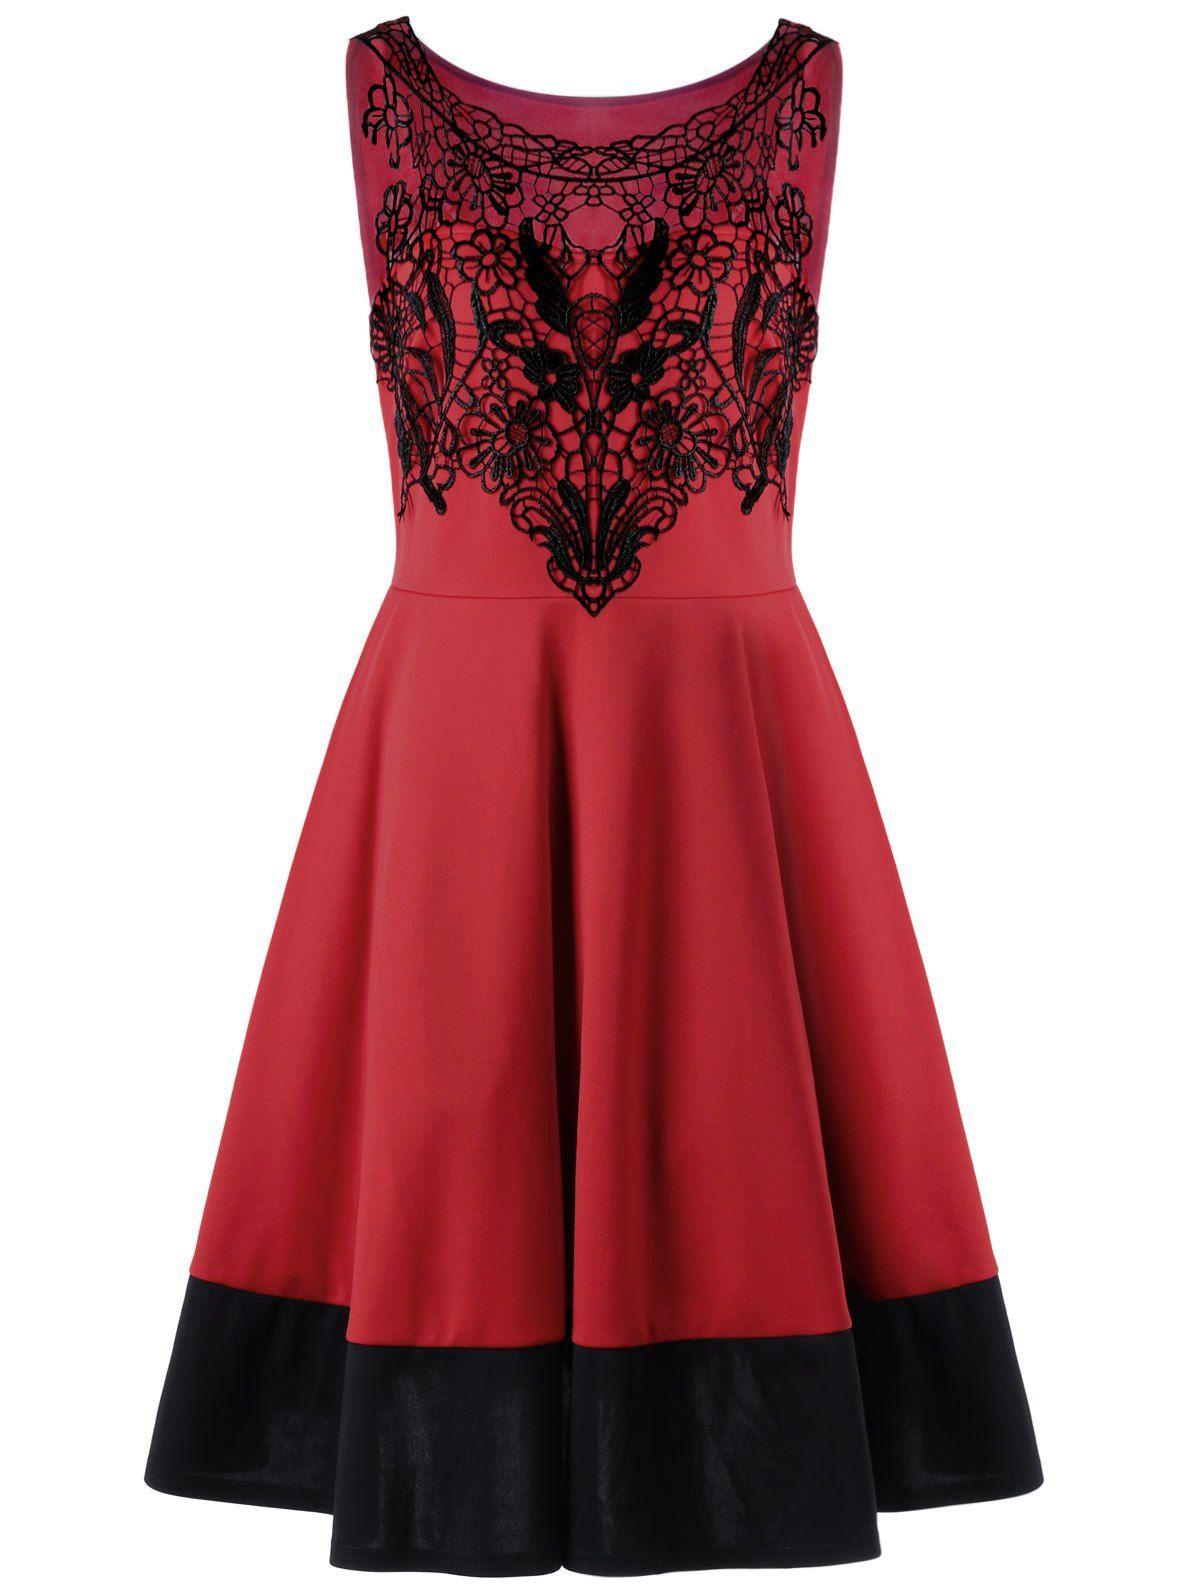 Crochet Insert Plus Size Cocktail Prom Dress Cheap Fashion Apple